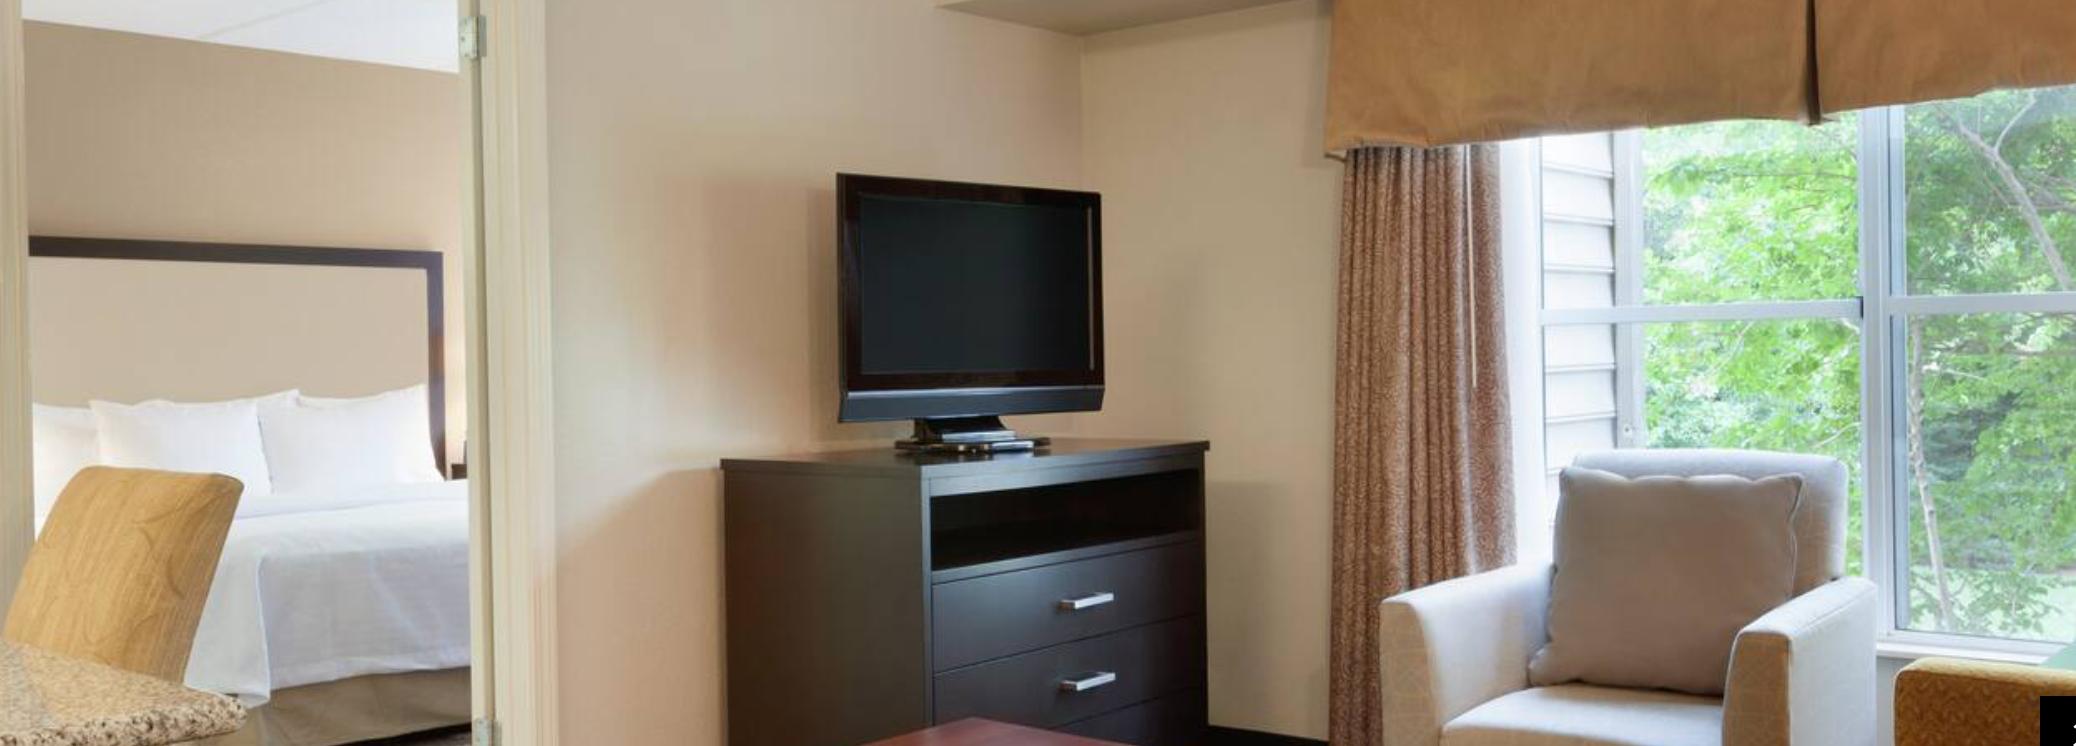 https://www.hotelsbyday.com/_data/default-hotel_image/3/18205/screenshot-2020-06-11-at-4-23-11-pm.png